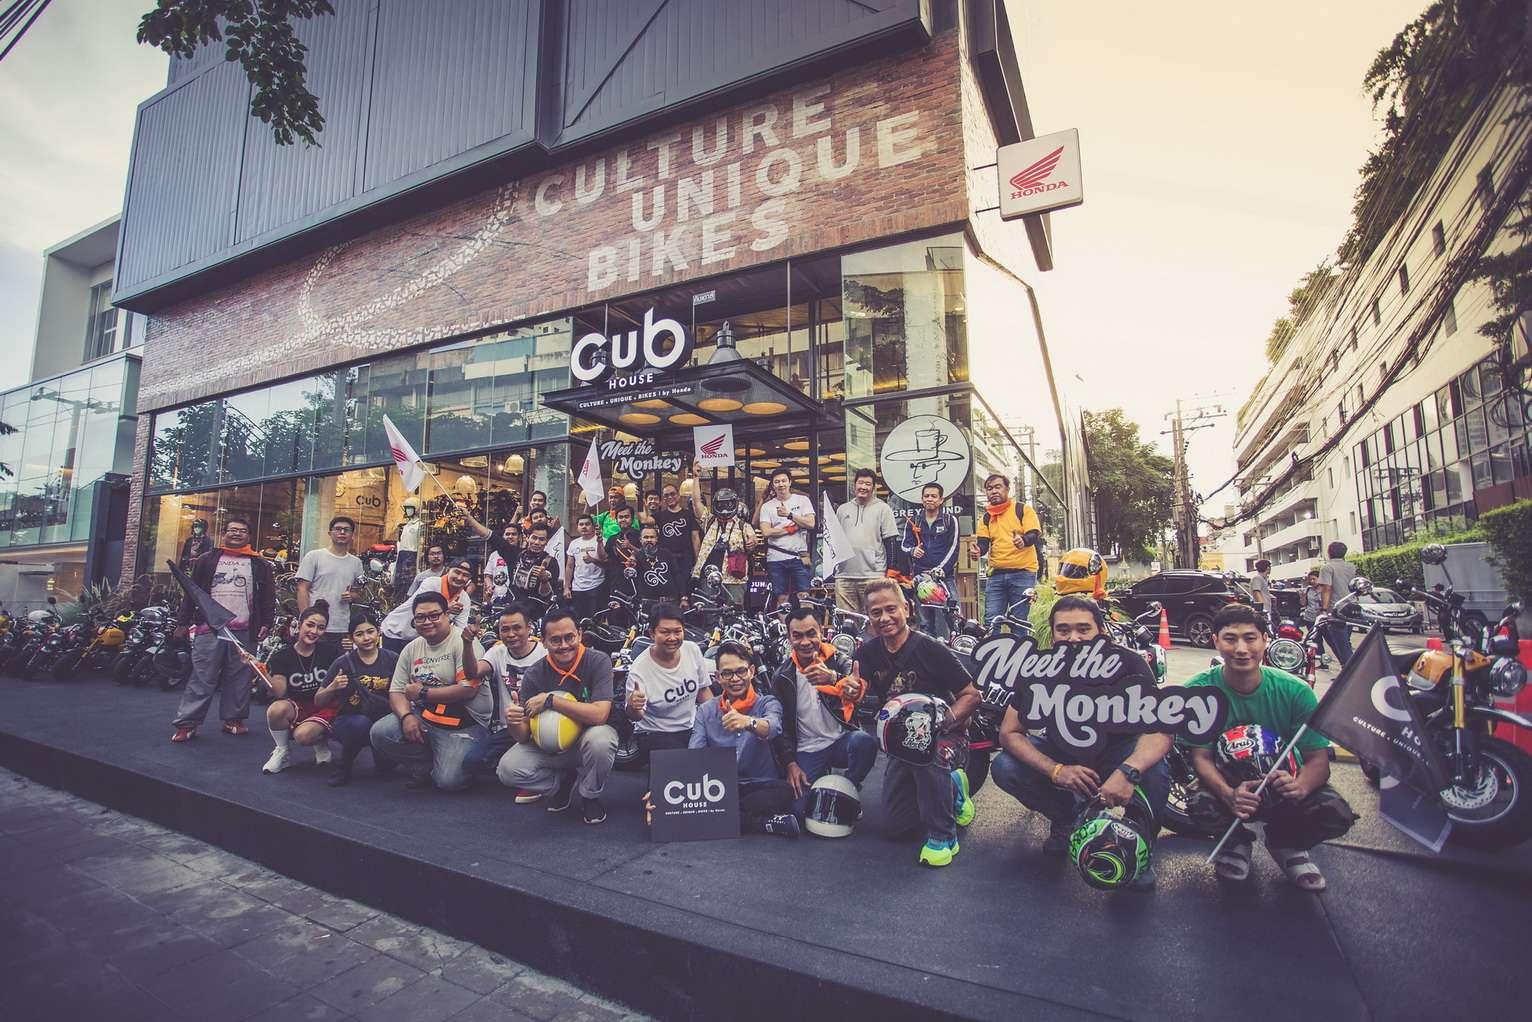 CUB House สร้างประสบการณ์ไลฟ์สไตล์รูปแบบใหม่ กับกิจกรรม 'MEET the Monkey' รวมพลความซนของเหล่า Genuine - Webike Thailand